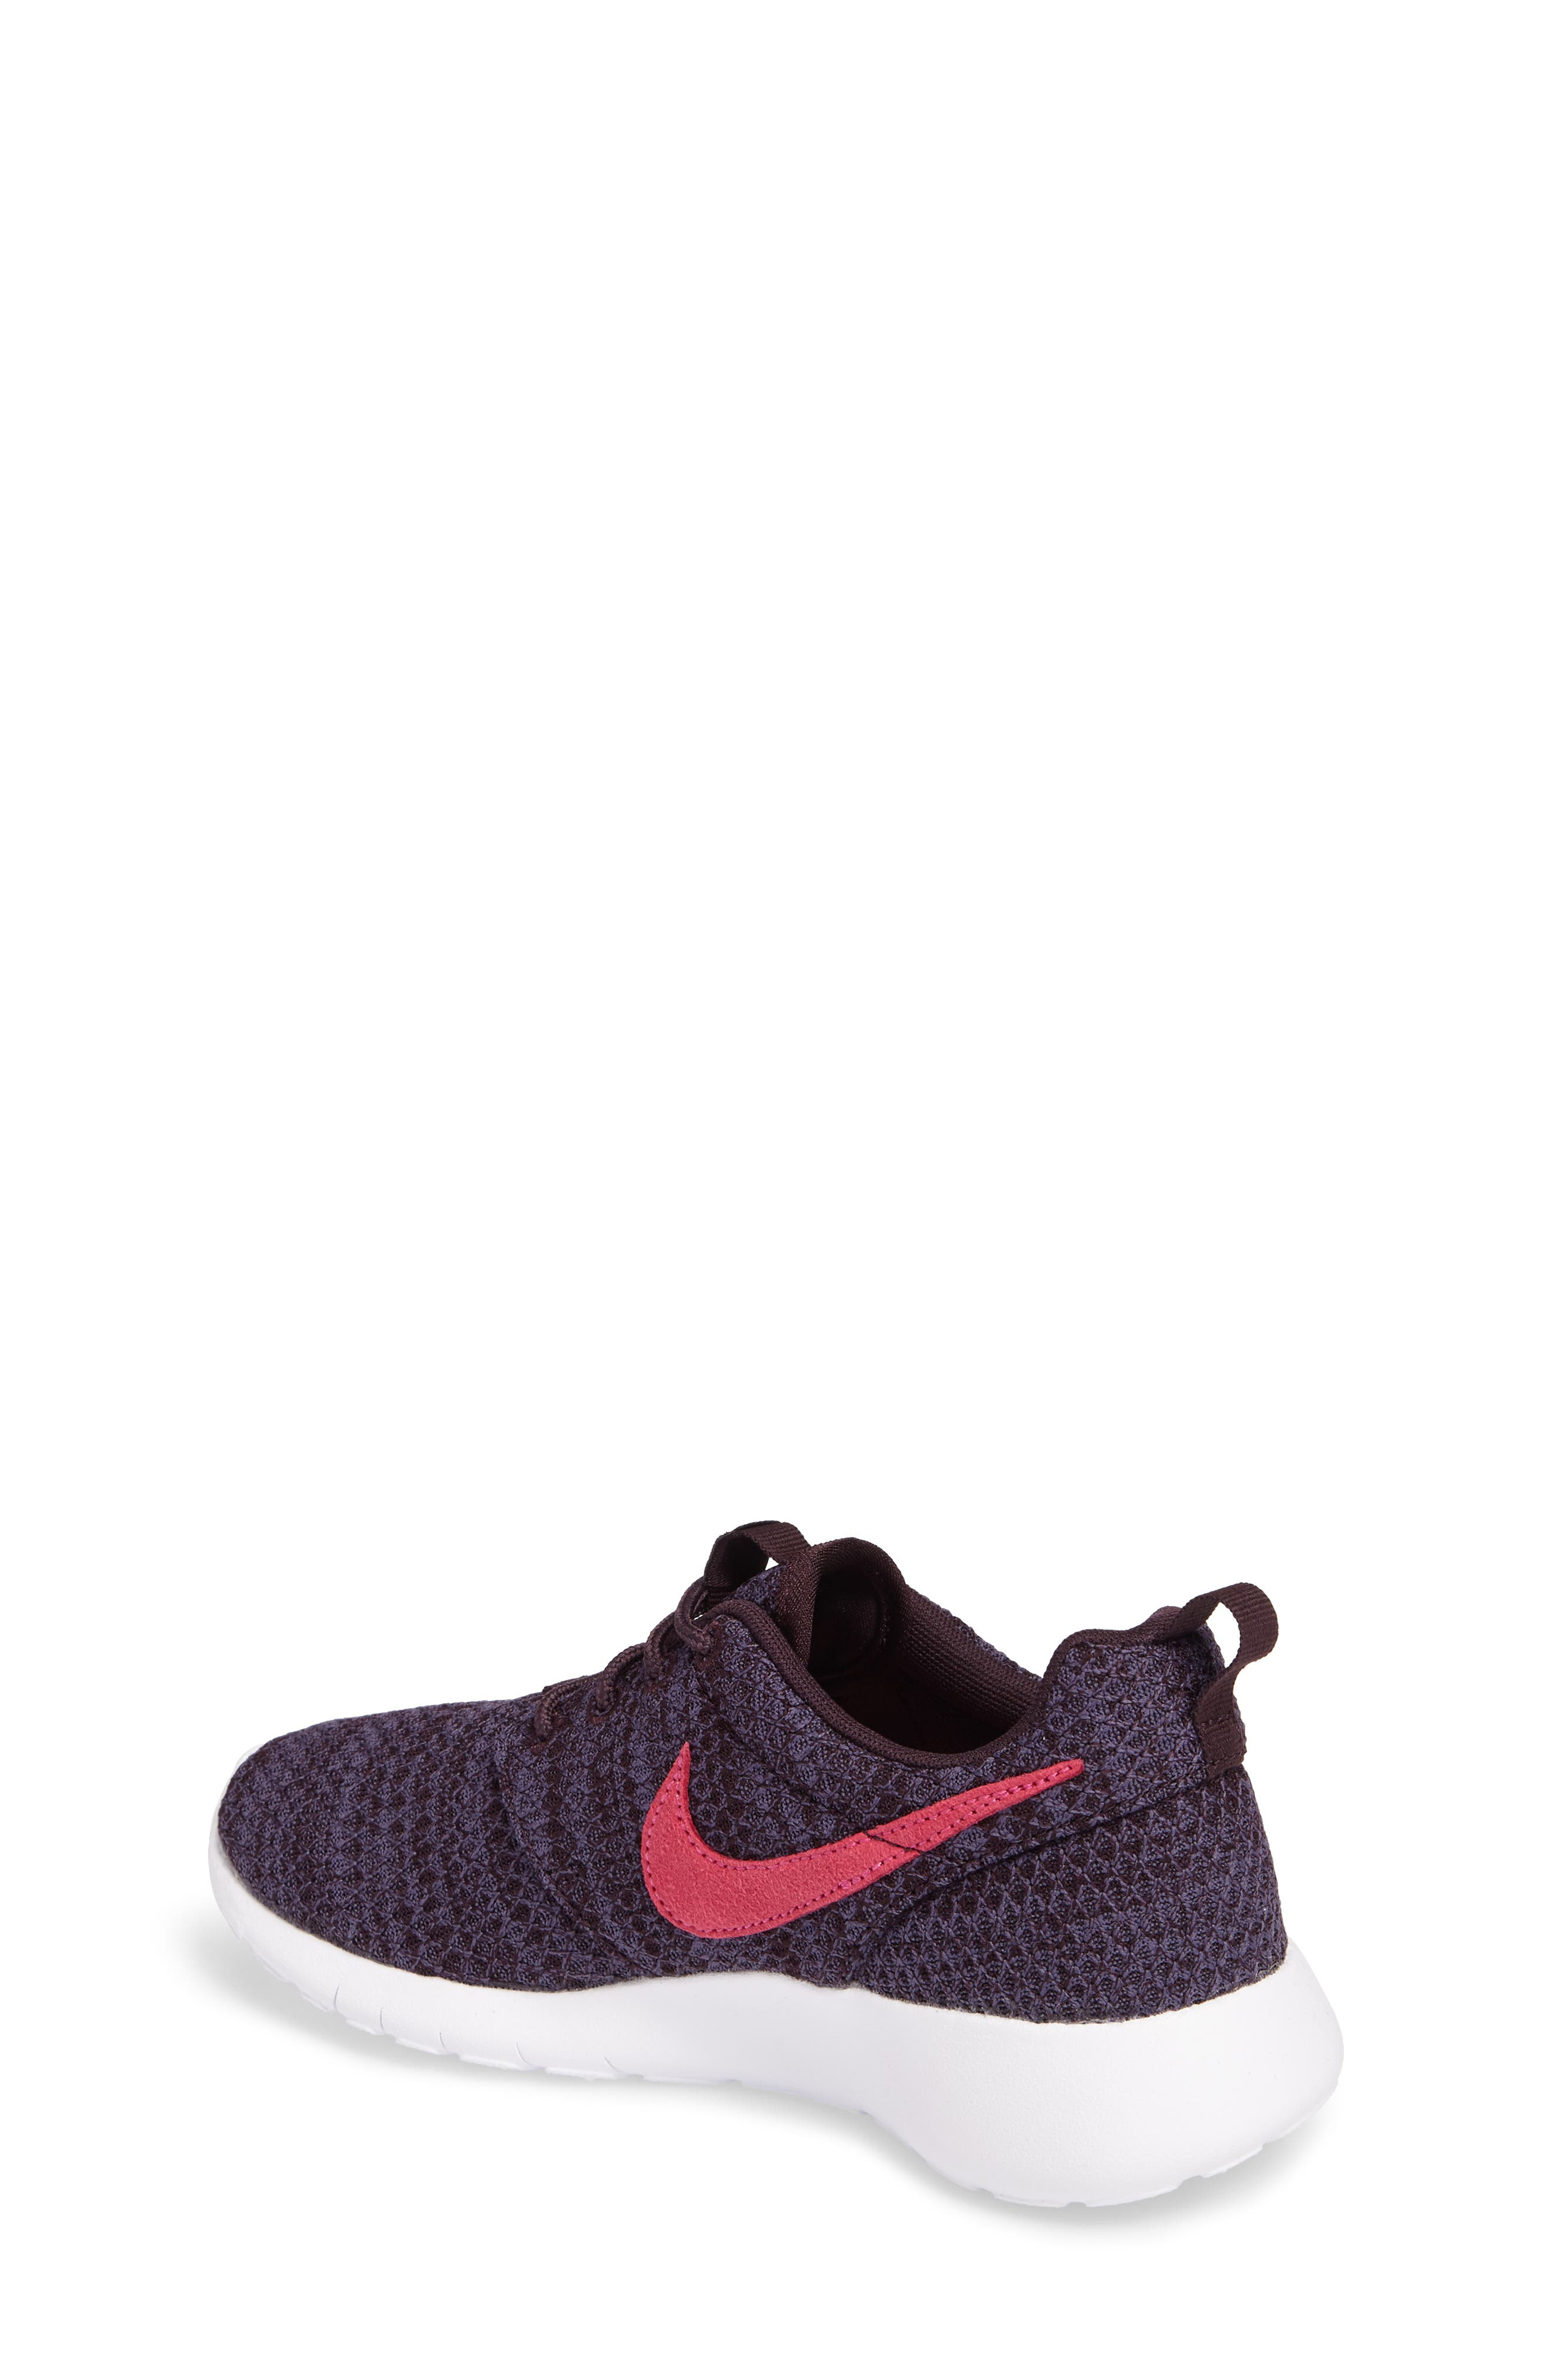 'Roshe Run' Athletic Shoe,                             Alternate thumbnail 112, color,